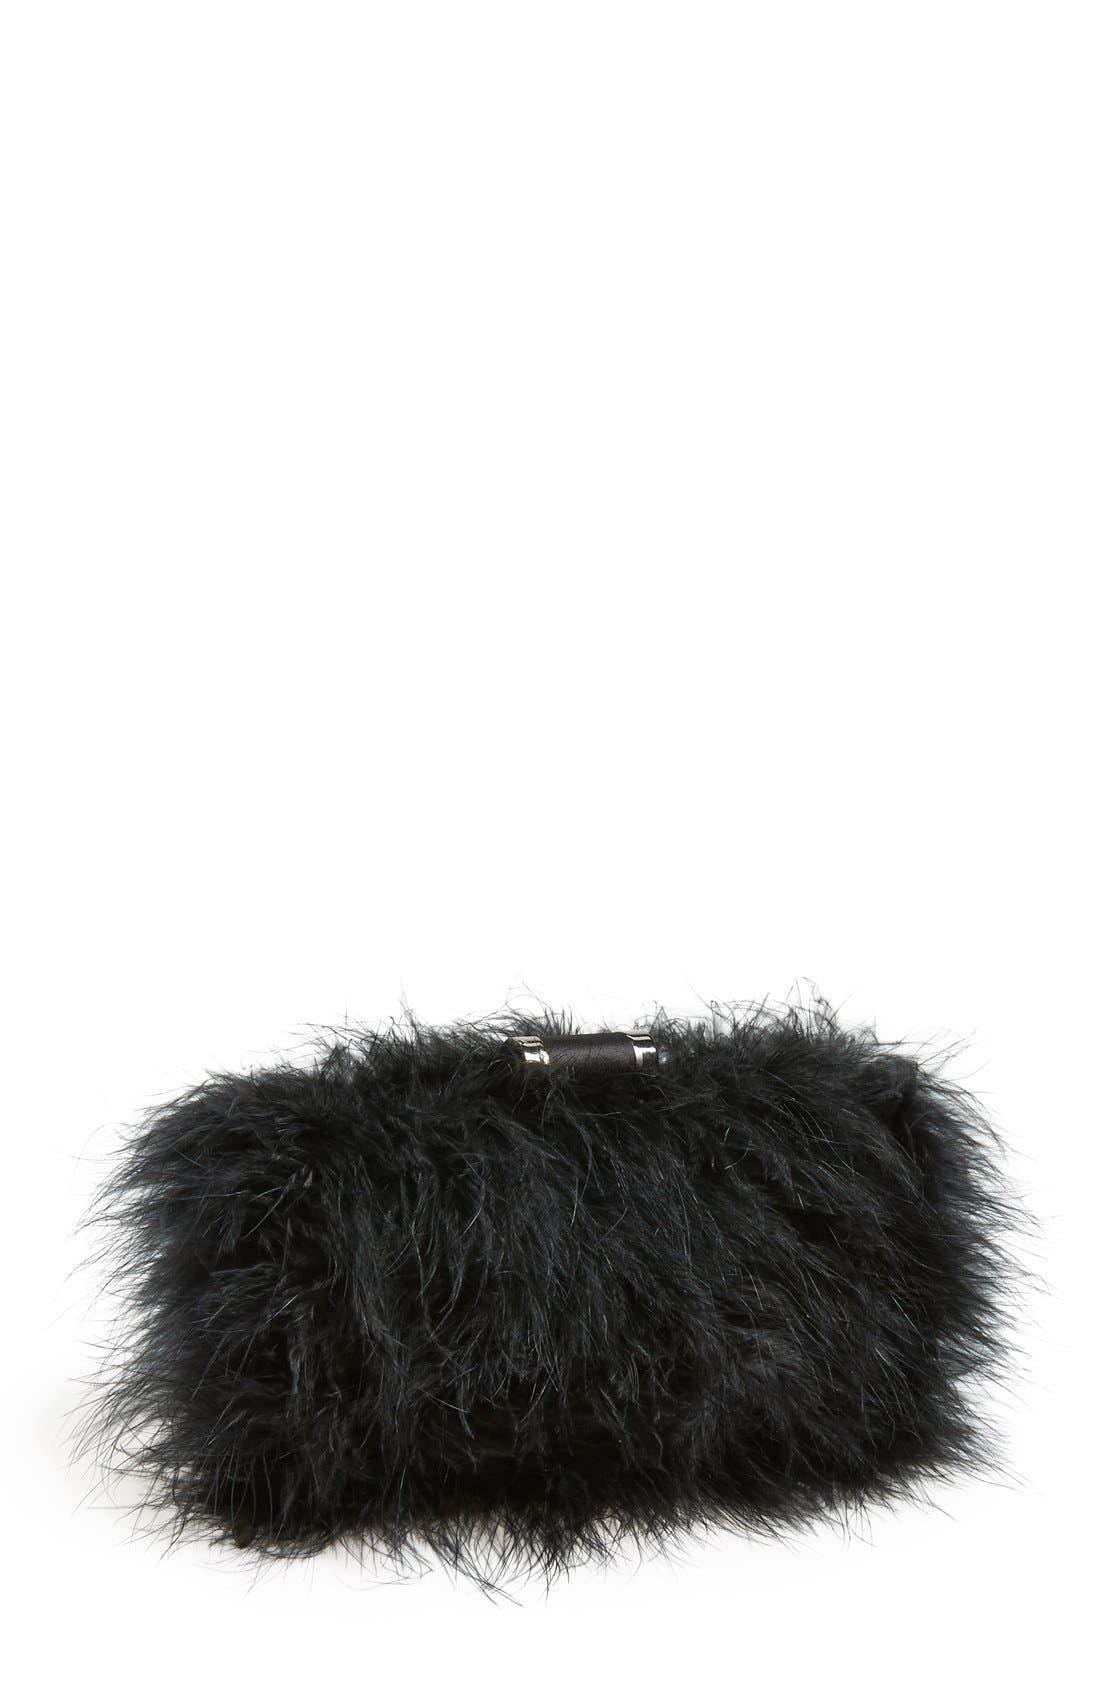 Main Image - Sondra Roberts 'Furry Monster' Feather Clutch